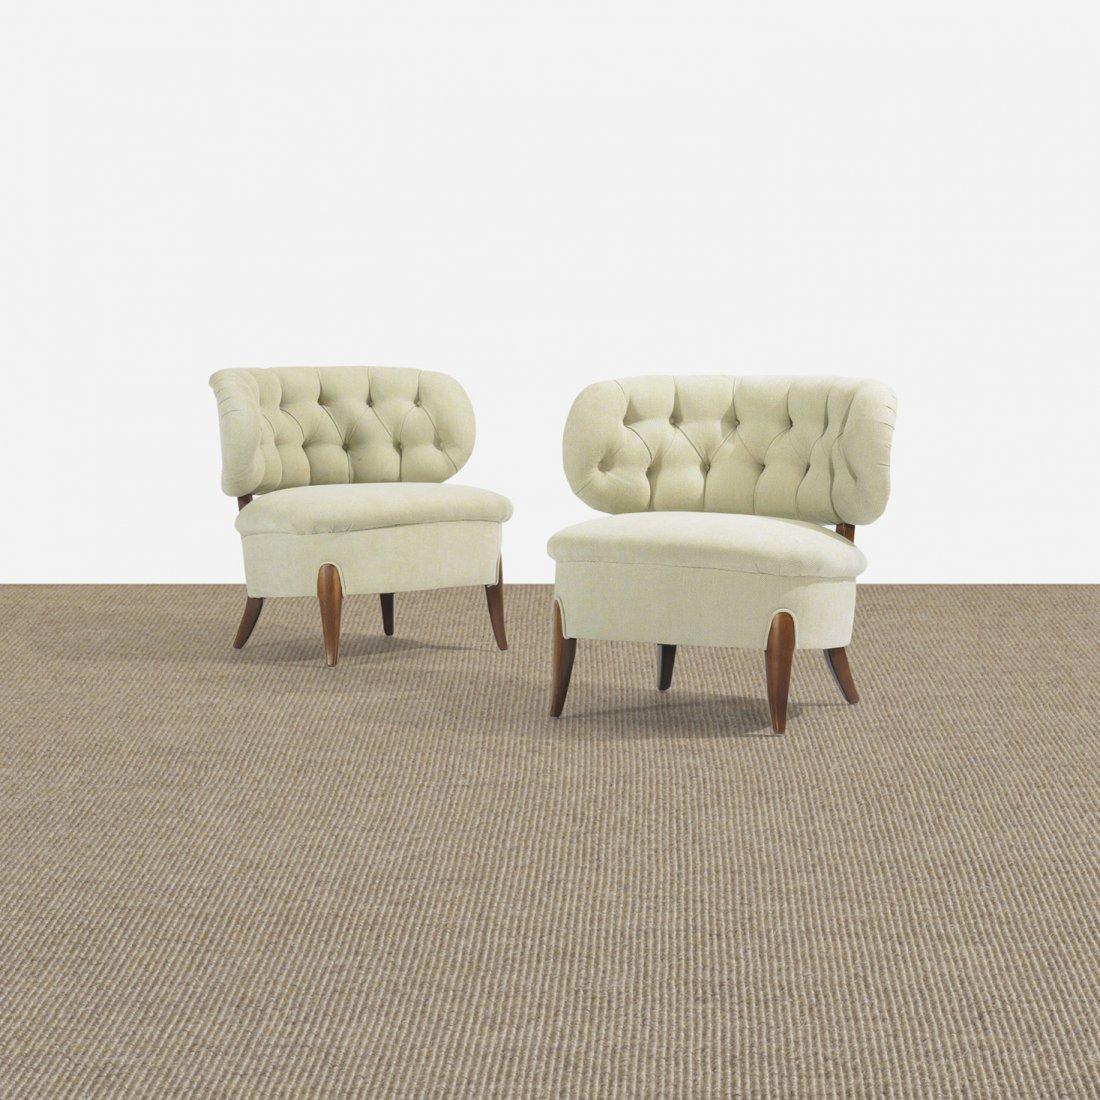 121: Otto Schultz lounge chairs, pair